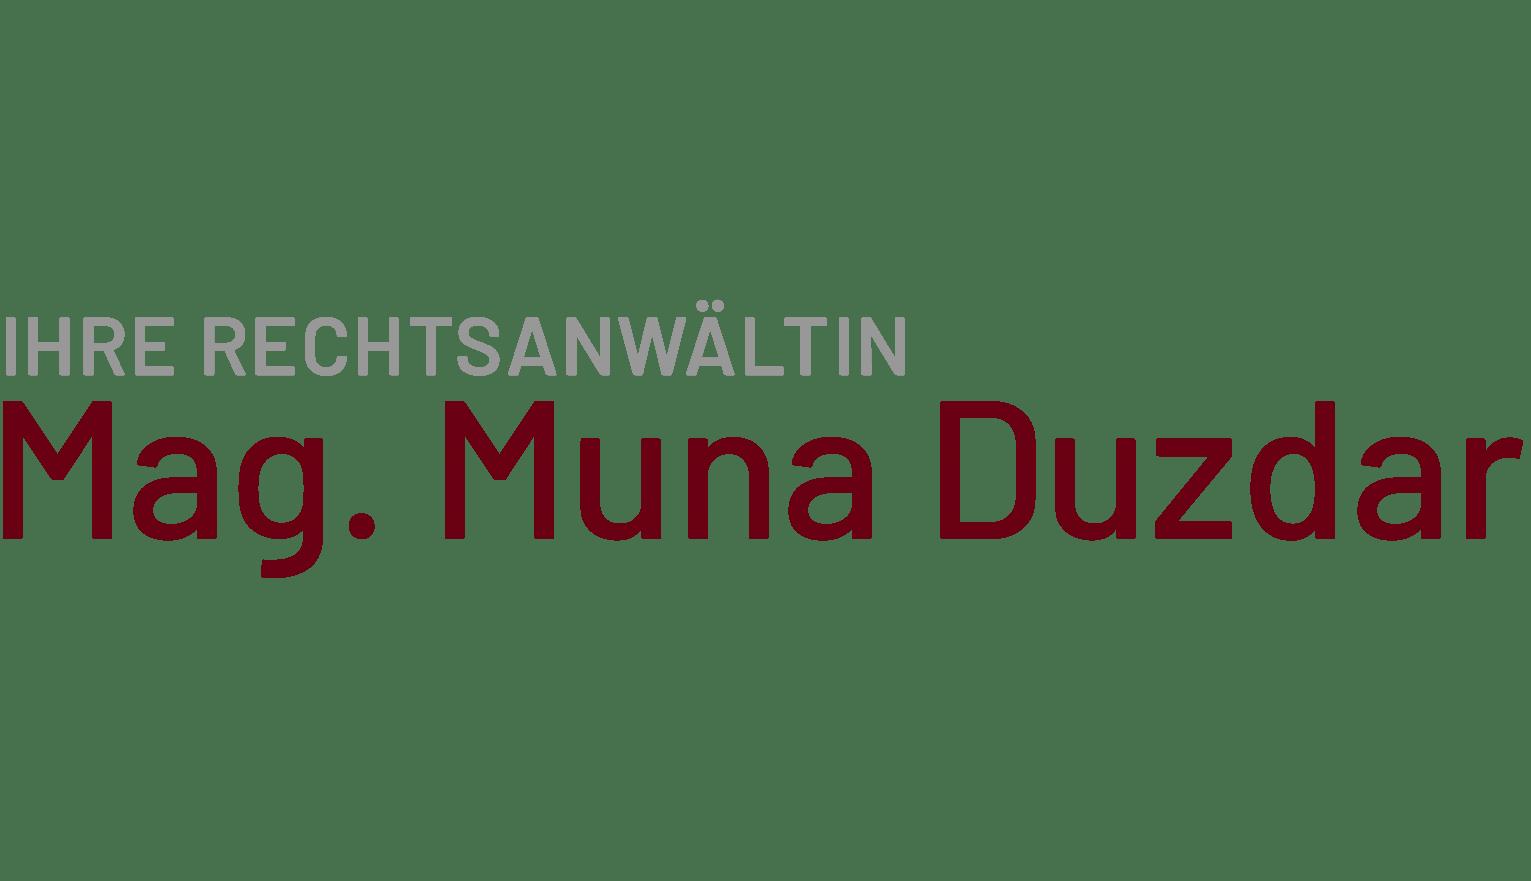 Mag. Muna Duzdar 1080 Wien Logo